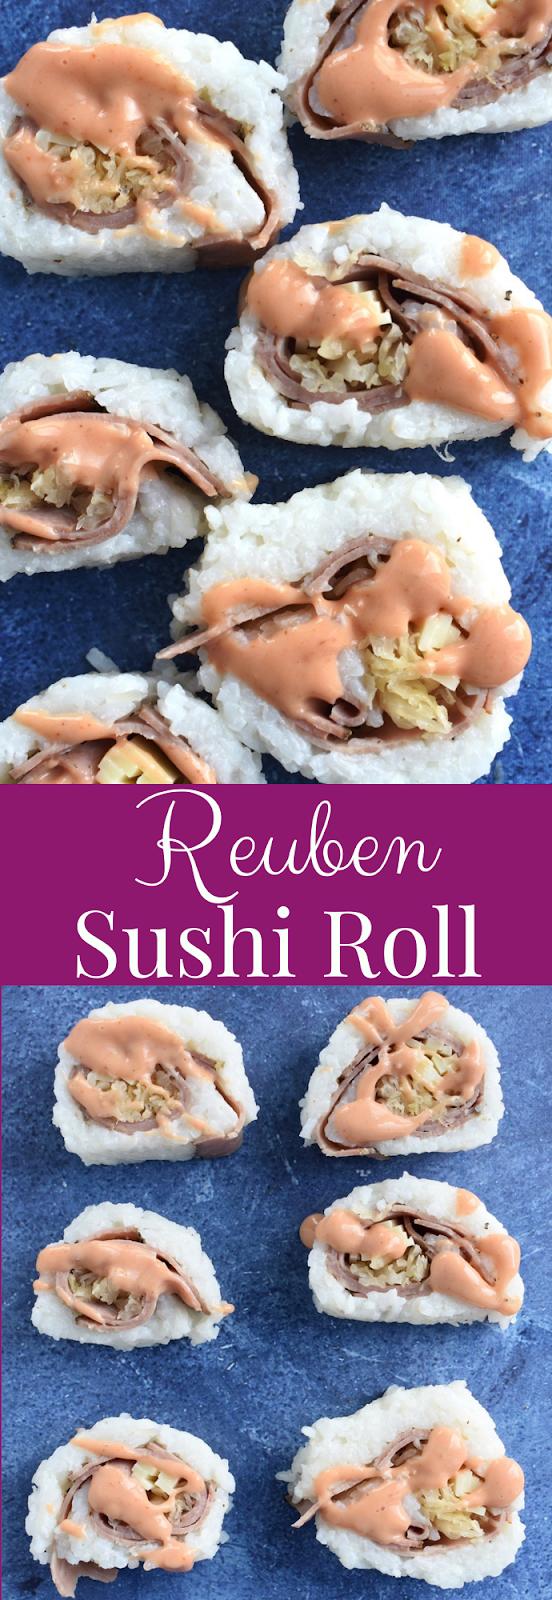 Reuben Sushi Roll recipe